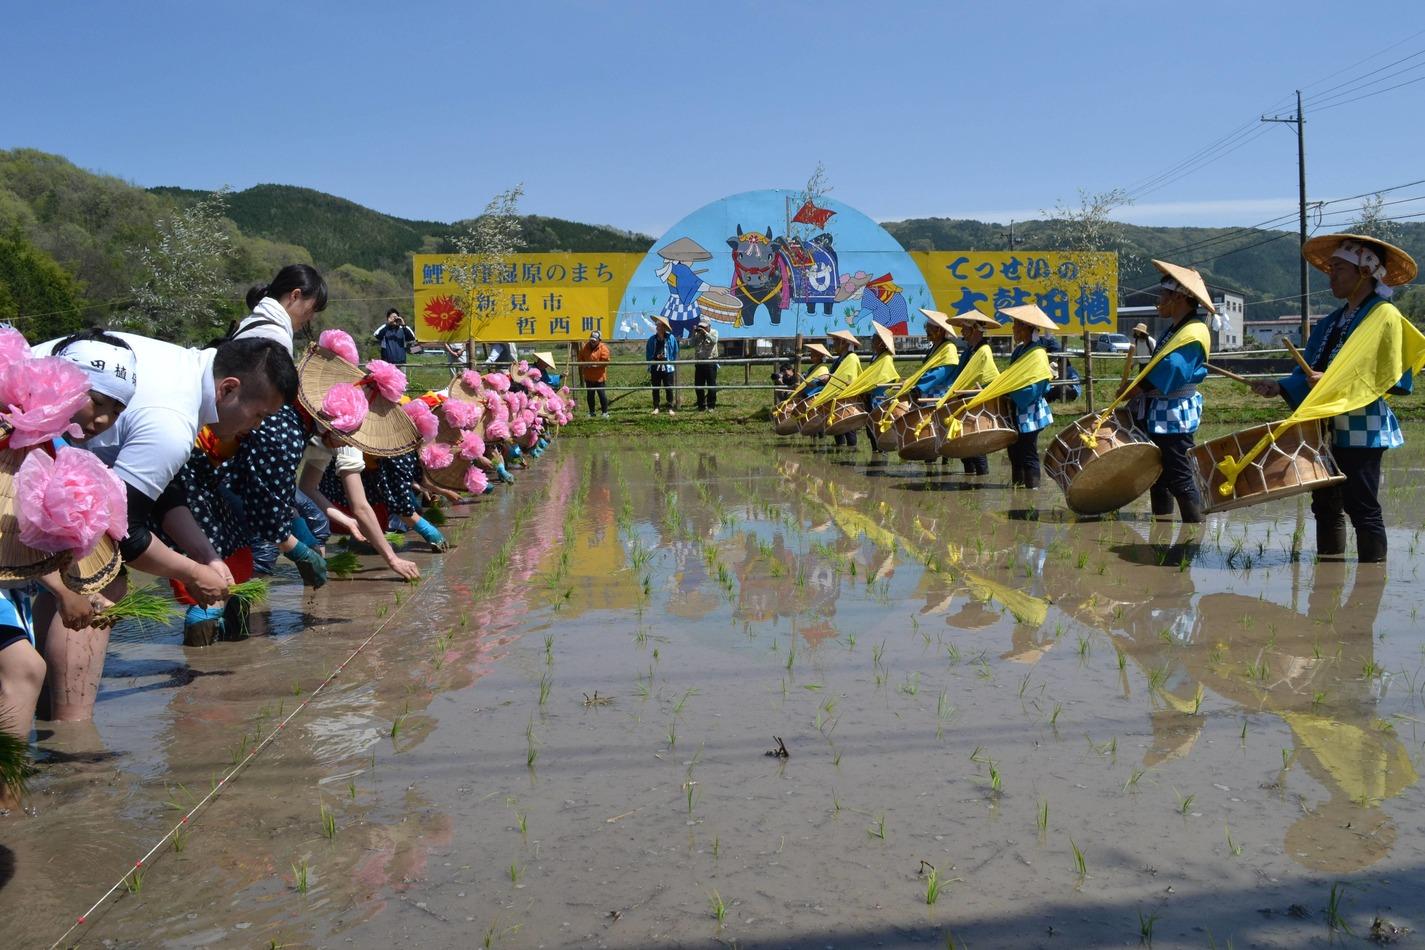 Koigakubo Wetland Festival